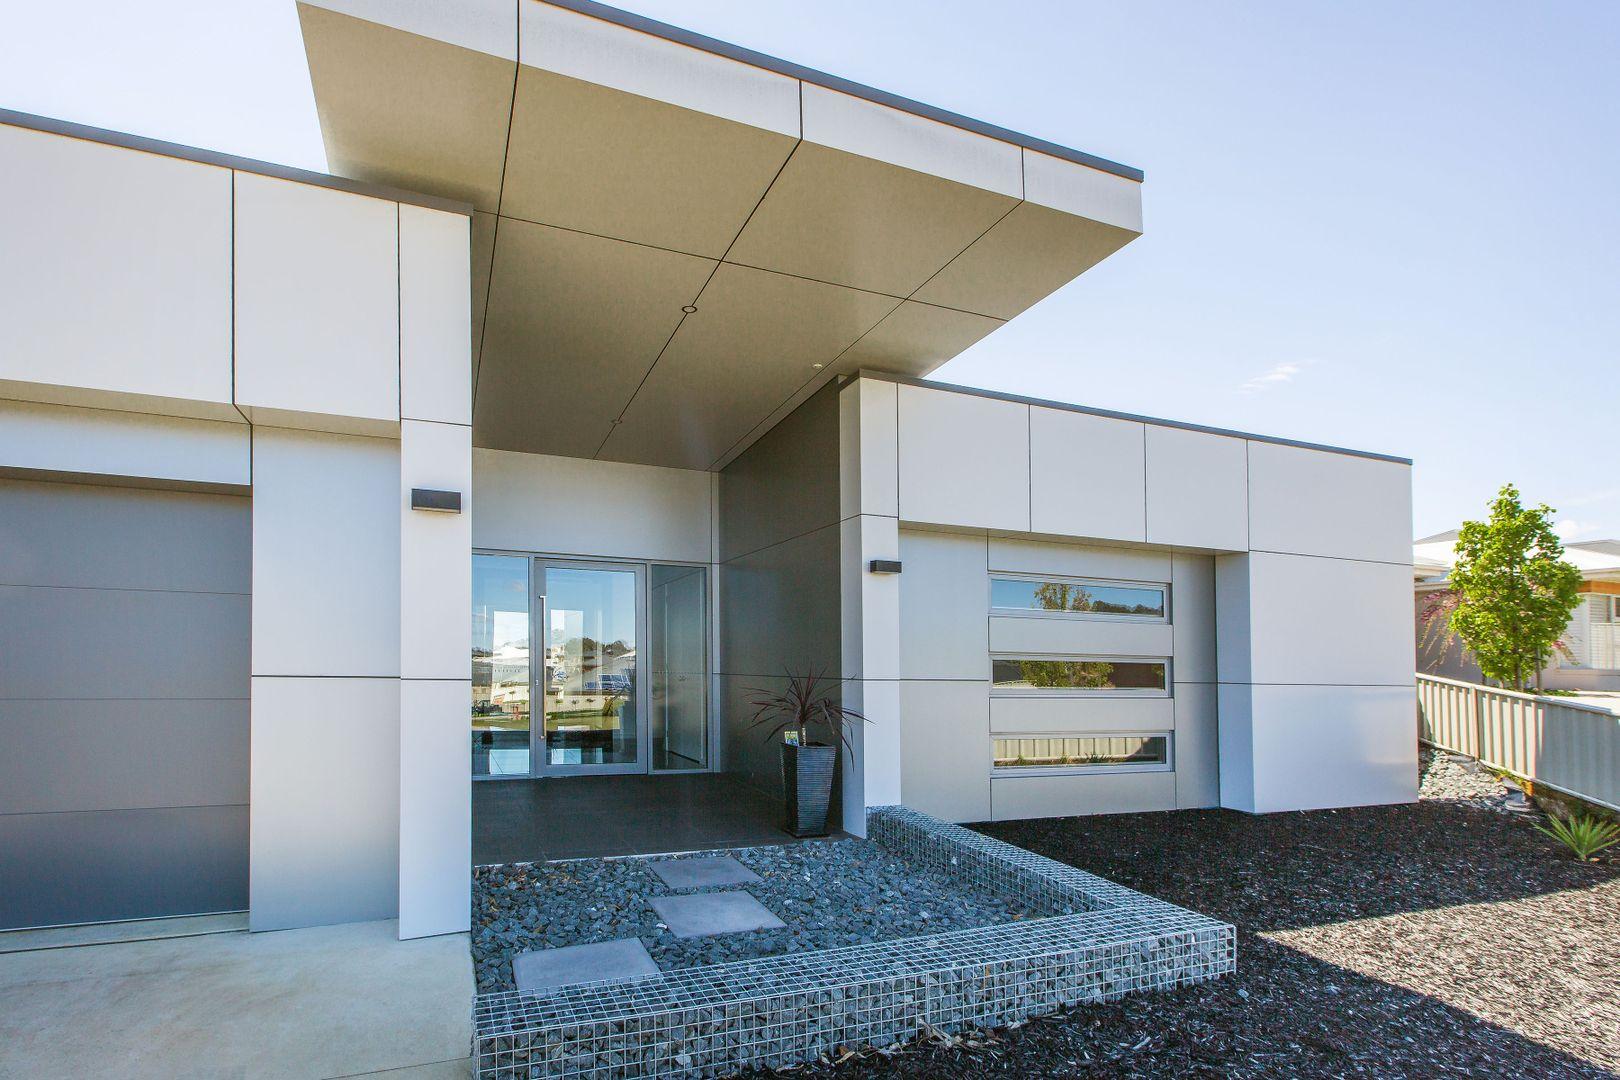 214 Pickworth Court, Thurgoona NSW 2640, Image 0